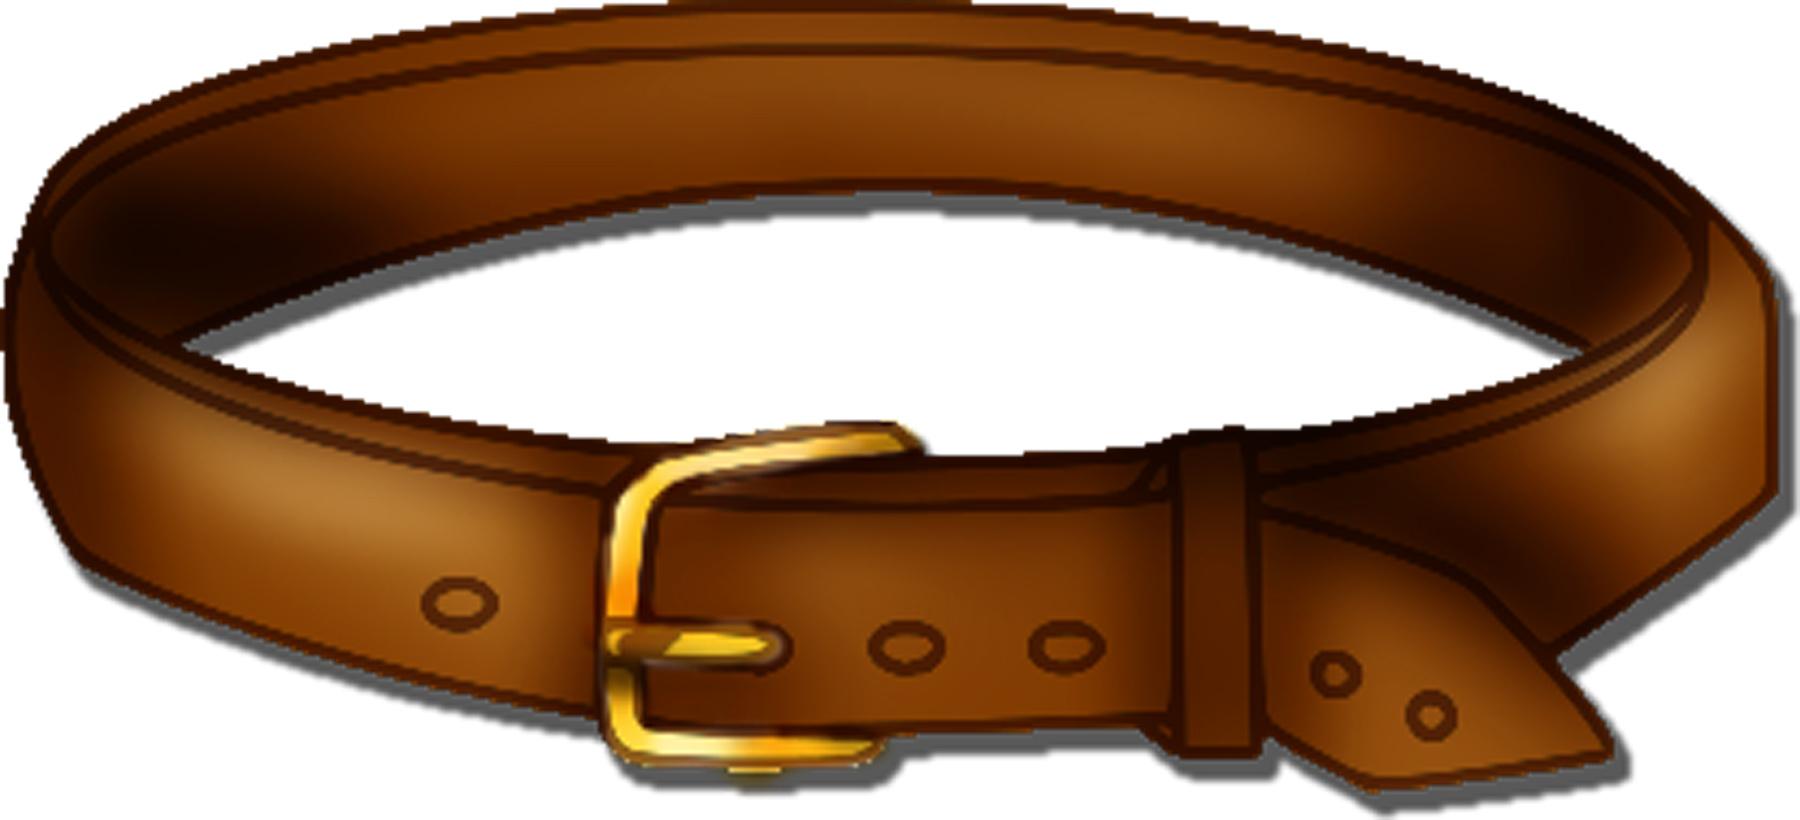 yellow belt clipart - photo #23